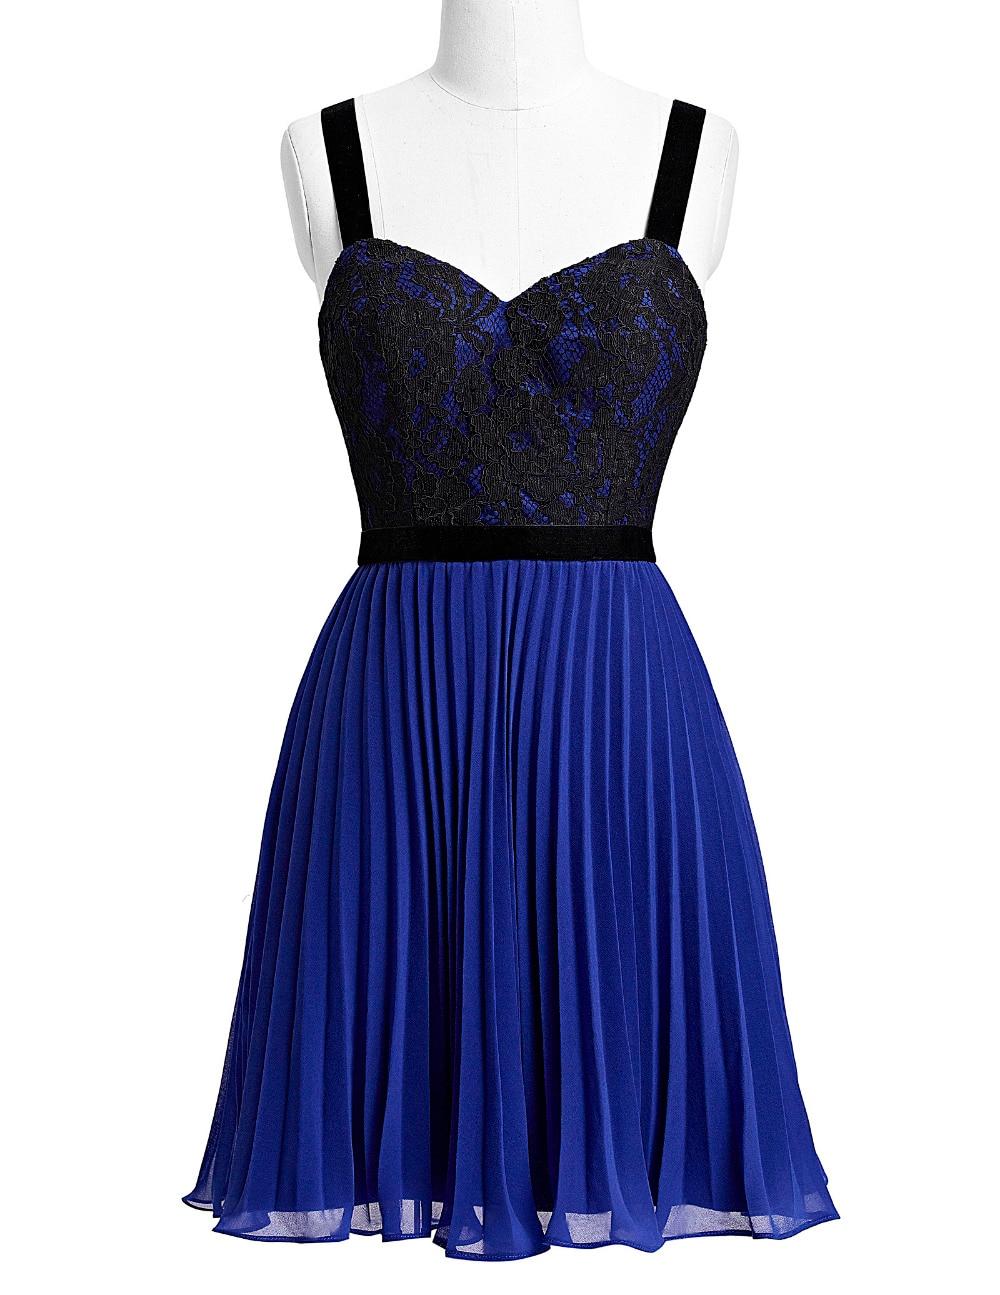 Online Get Cheap Junior Prom Dresses -Aliexpress.com ...